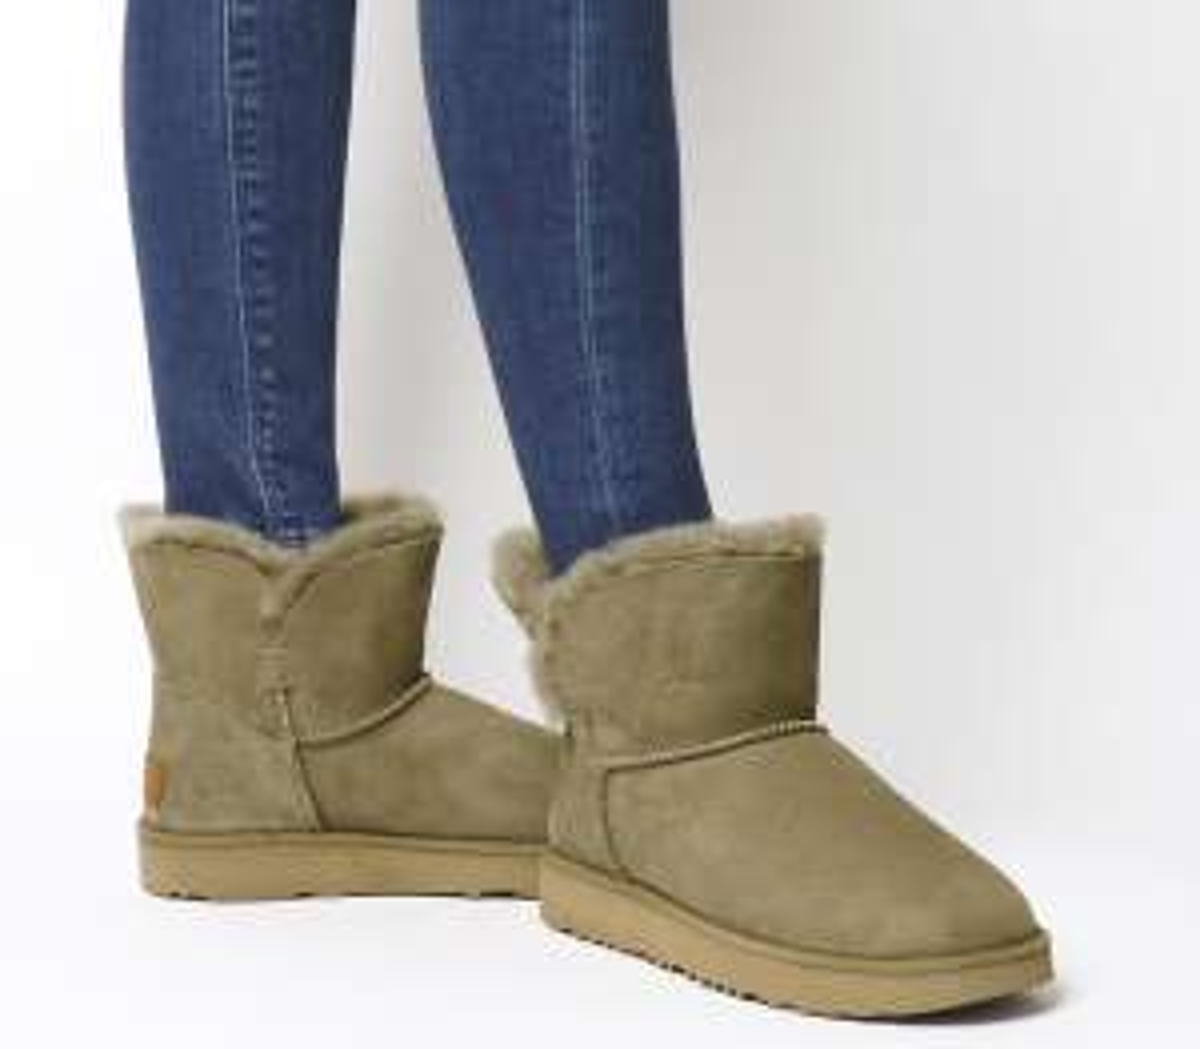 UGG Classic Cuff Mini Boots in der Farbe Antilope (Gr. 36-39)